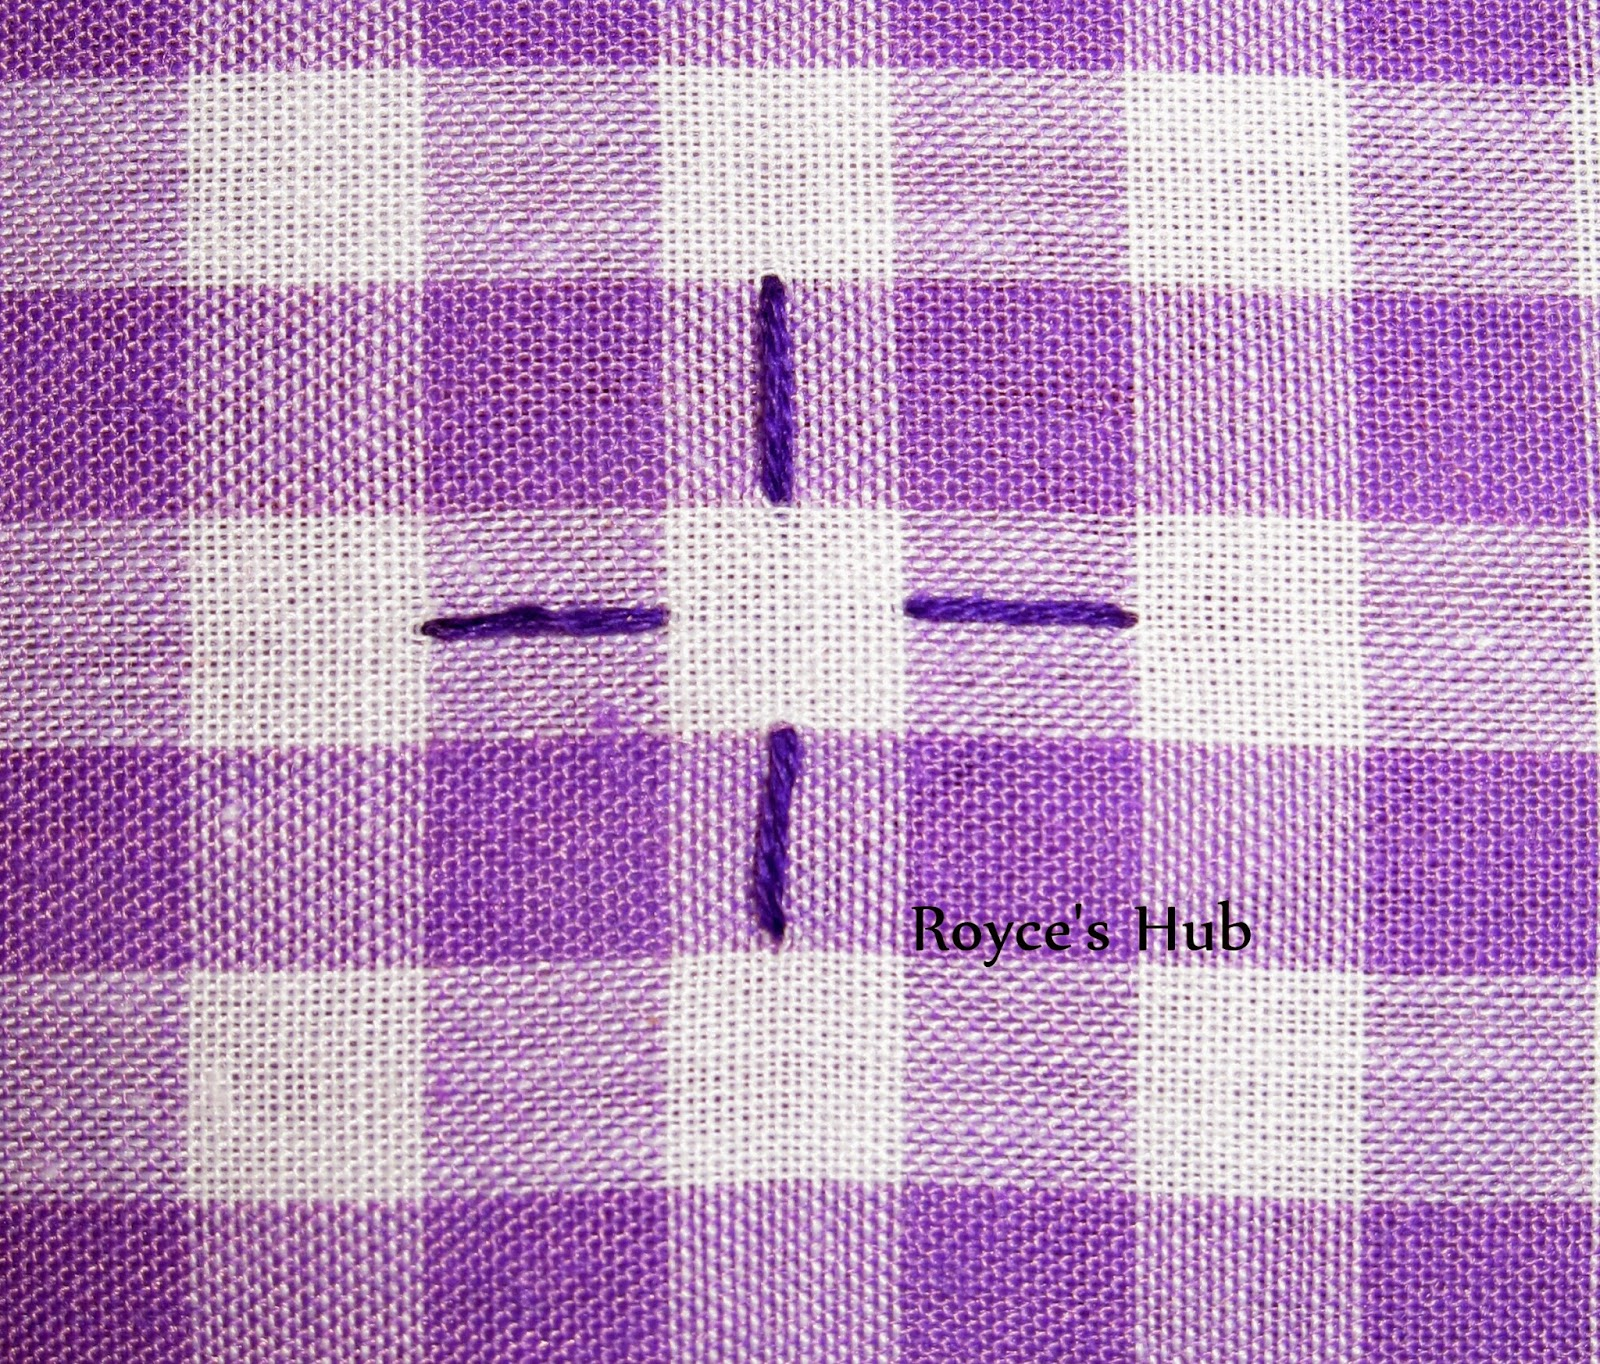 http://roycedavids.blogspot.ae/2013/12/chicken-scratchgingham-embroidery.html